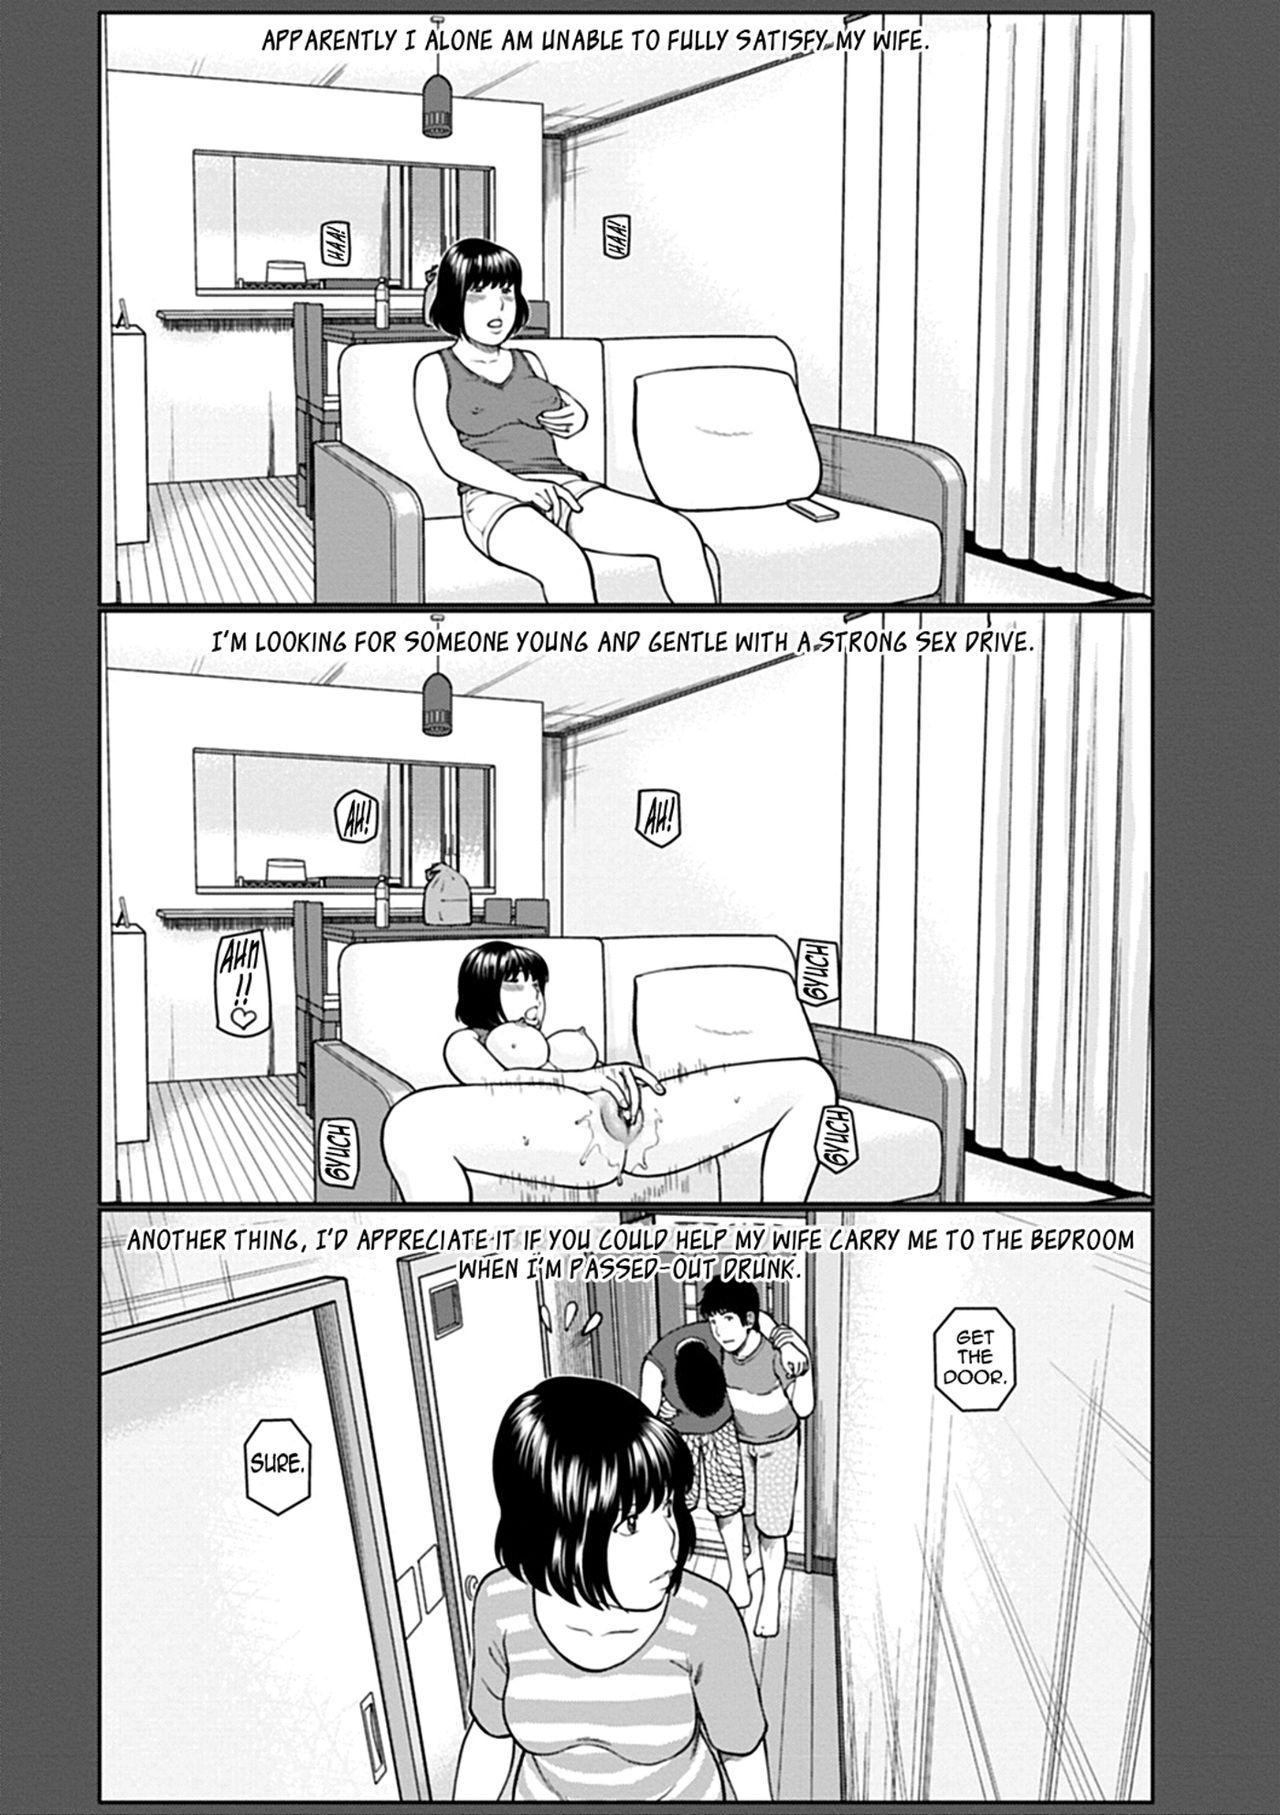 [Kuroki Hidehiko] 36-sai Injuku Sakarizuma | 36-Year-Old Randy Mature Wife [English] {Tadanohito} [Digital] [Uncensored] 168